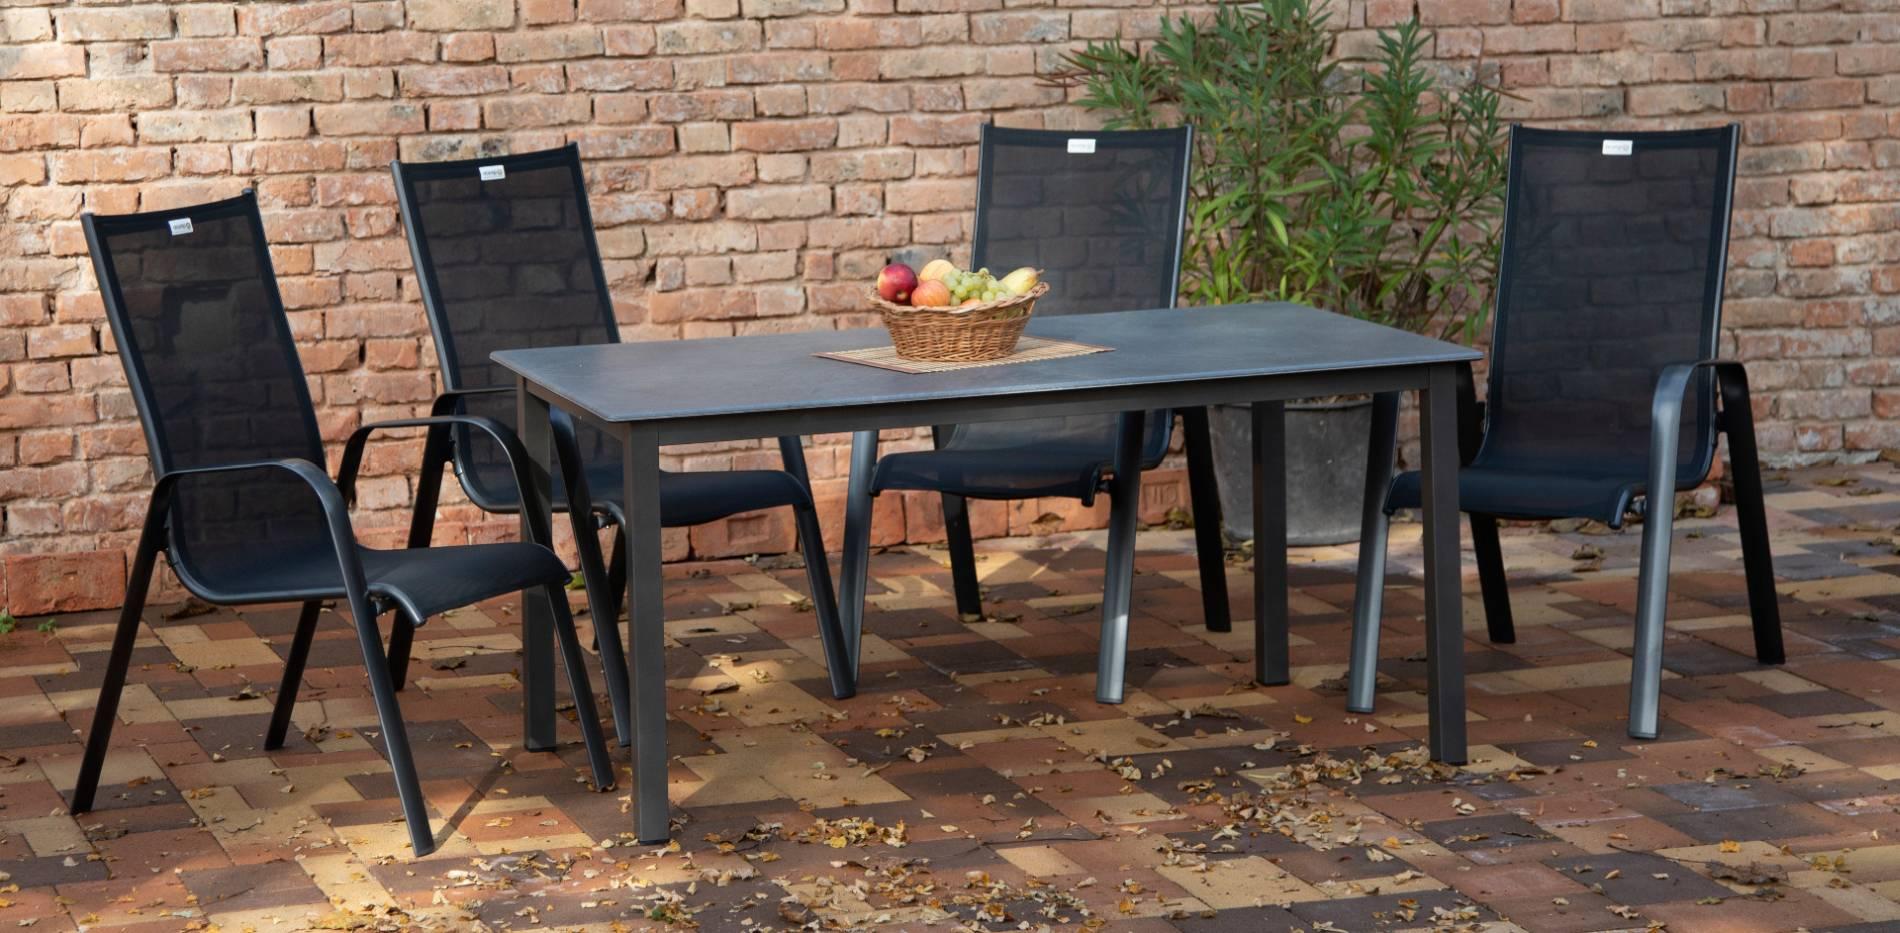 acamp Gartenmöbelset 4x Acatop Stapelsessel 56007 und 1x Tisch 56663 Acaplan 160 x 90 cm